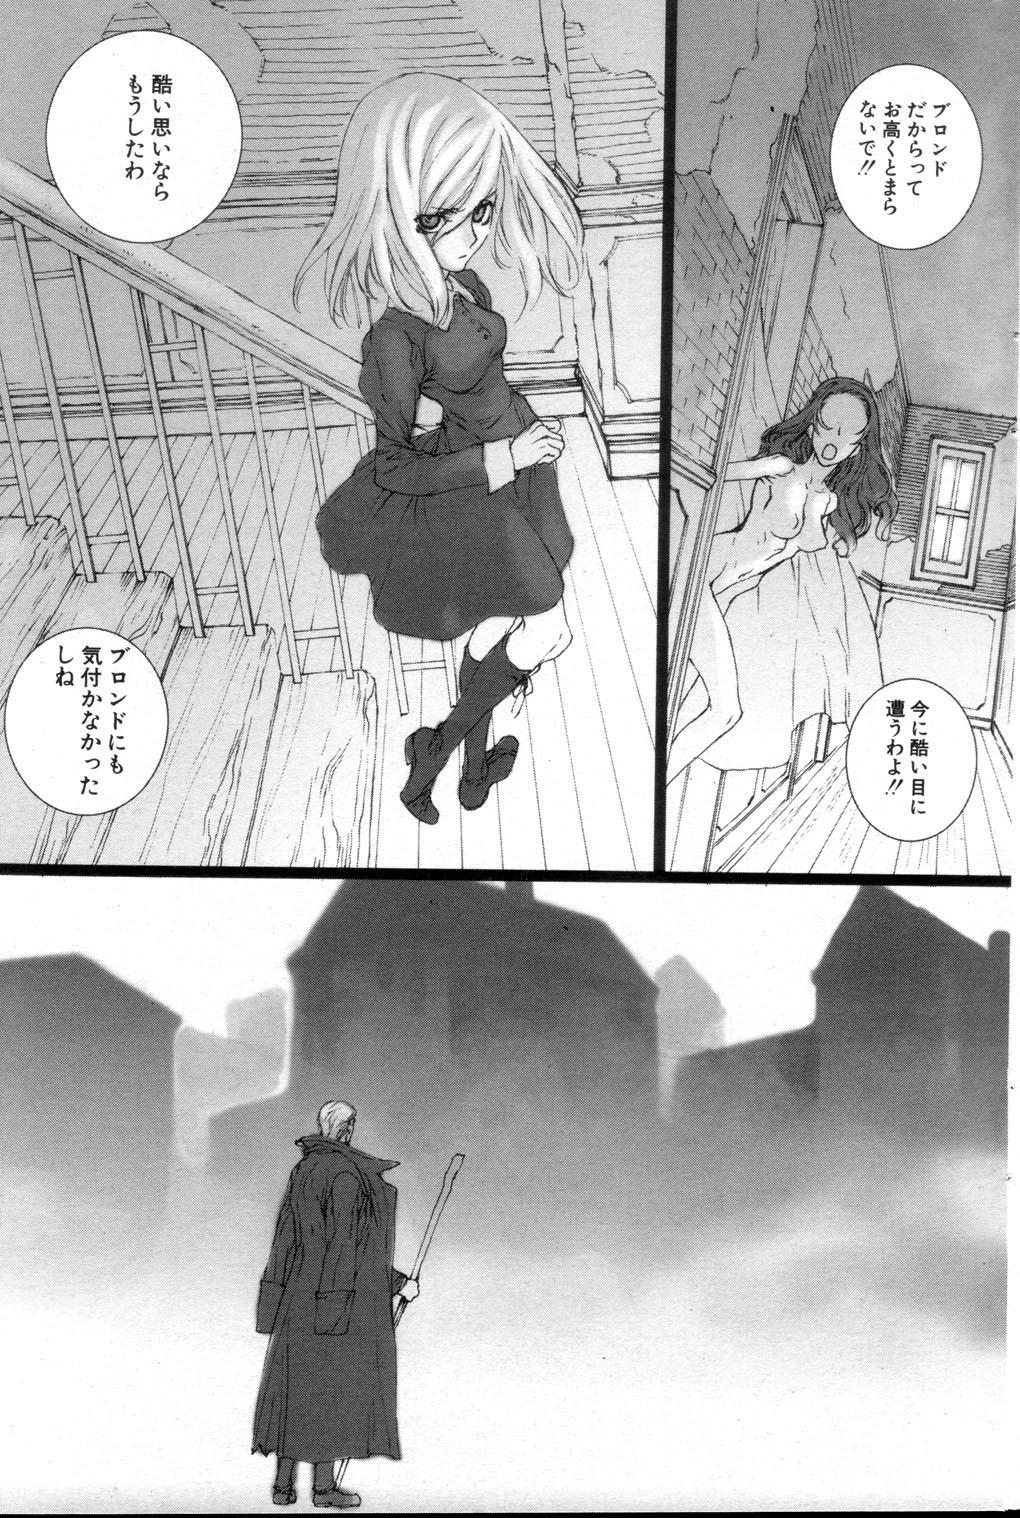 [Saiki Keita] FAIRY GONE GARDEN (Part Two) Kouhen 4